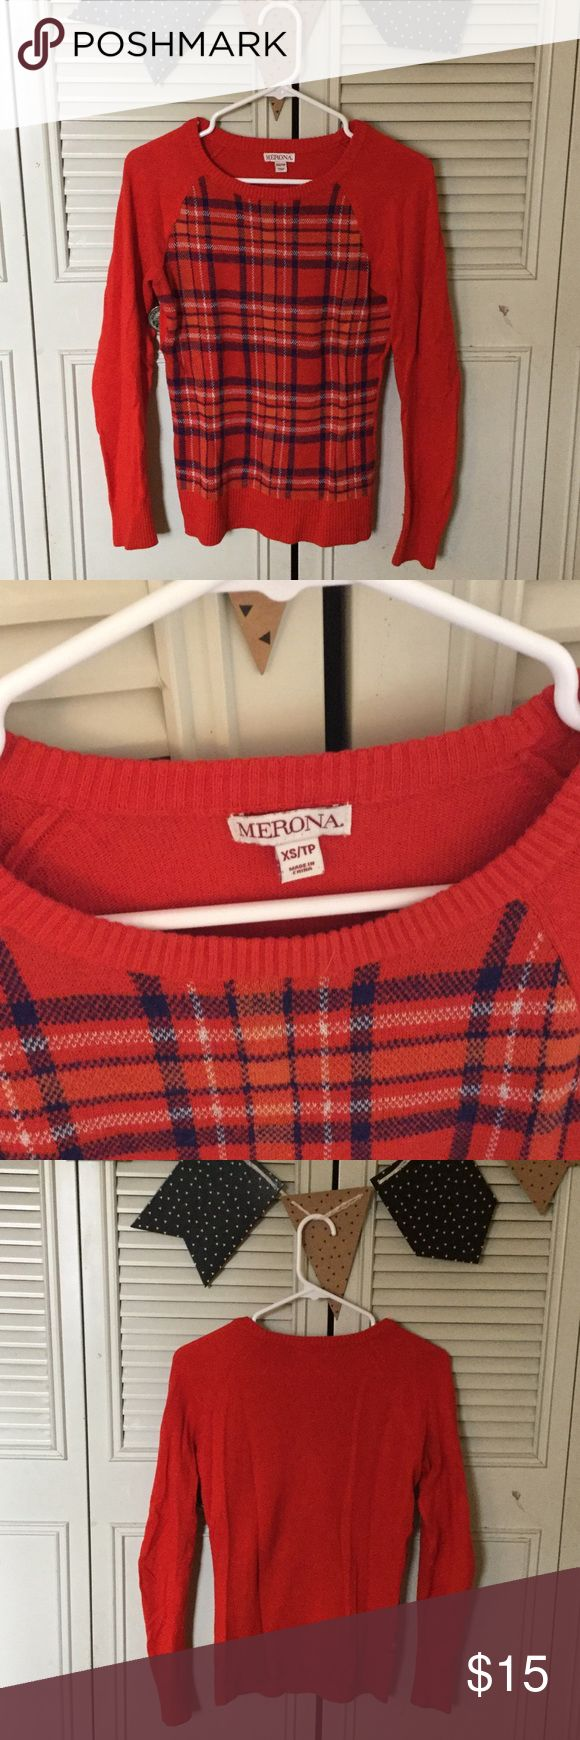 Selling this Red checkered sweater on Poshmark! My username is: vinglett. #shopmycloset #poshmark #fashion #shopping #style #forsale #Merona #Sweaters